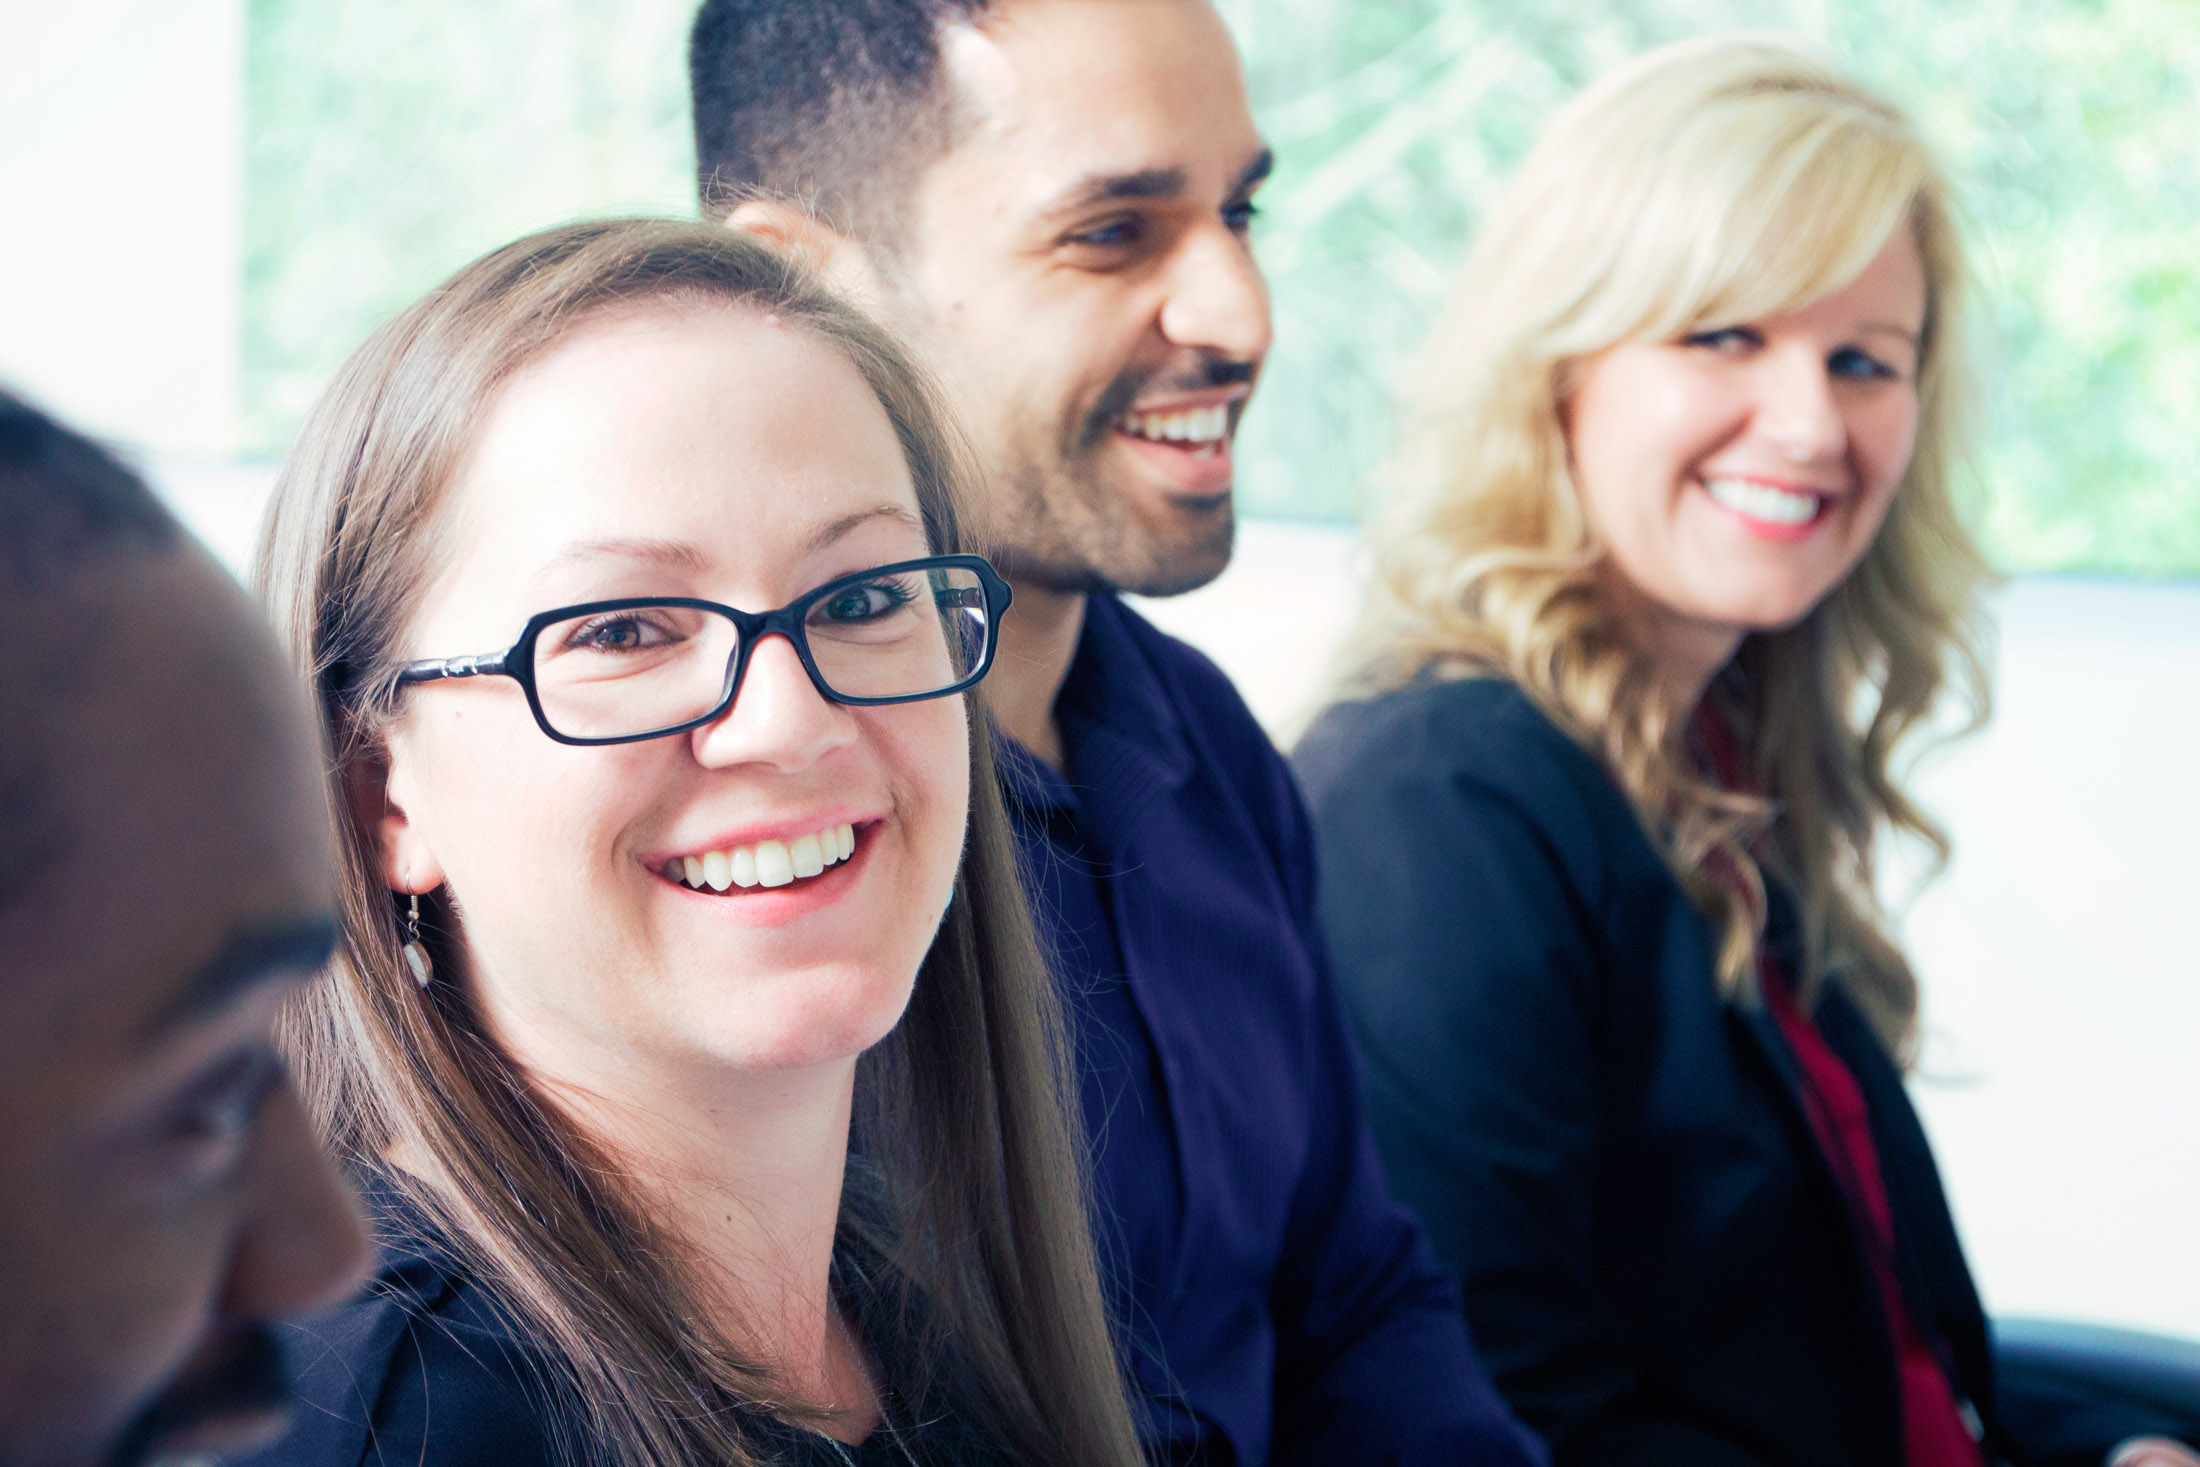 ea health culture photography ignyte branding agency